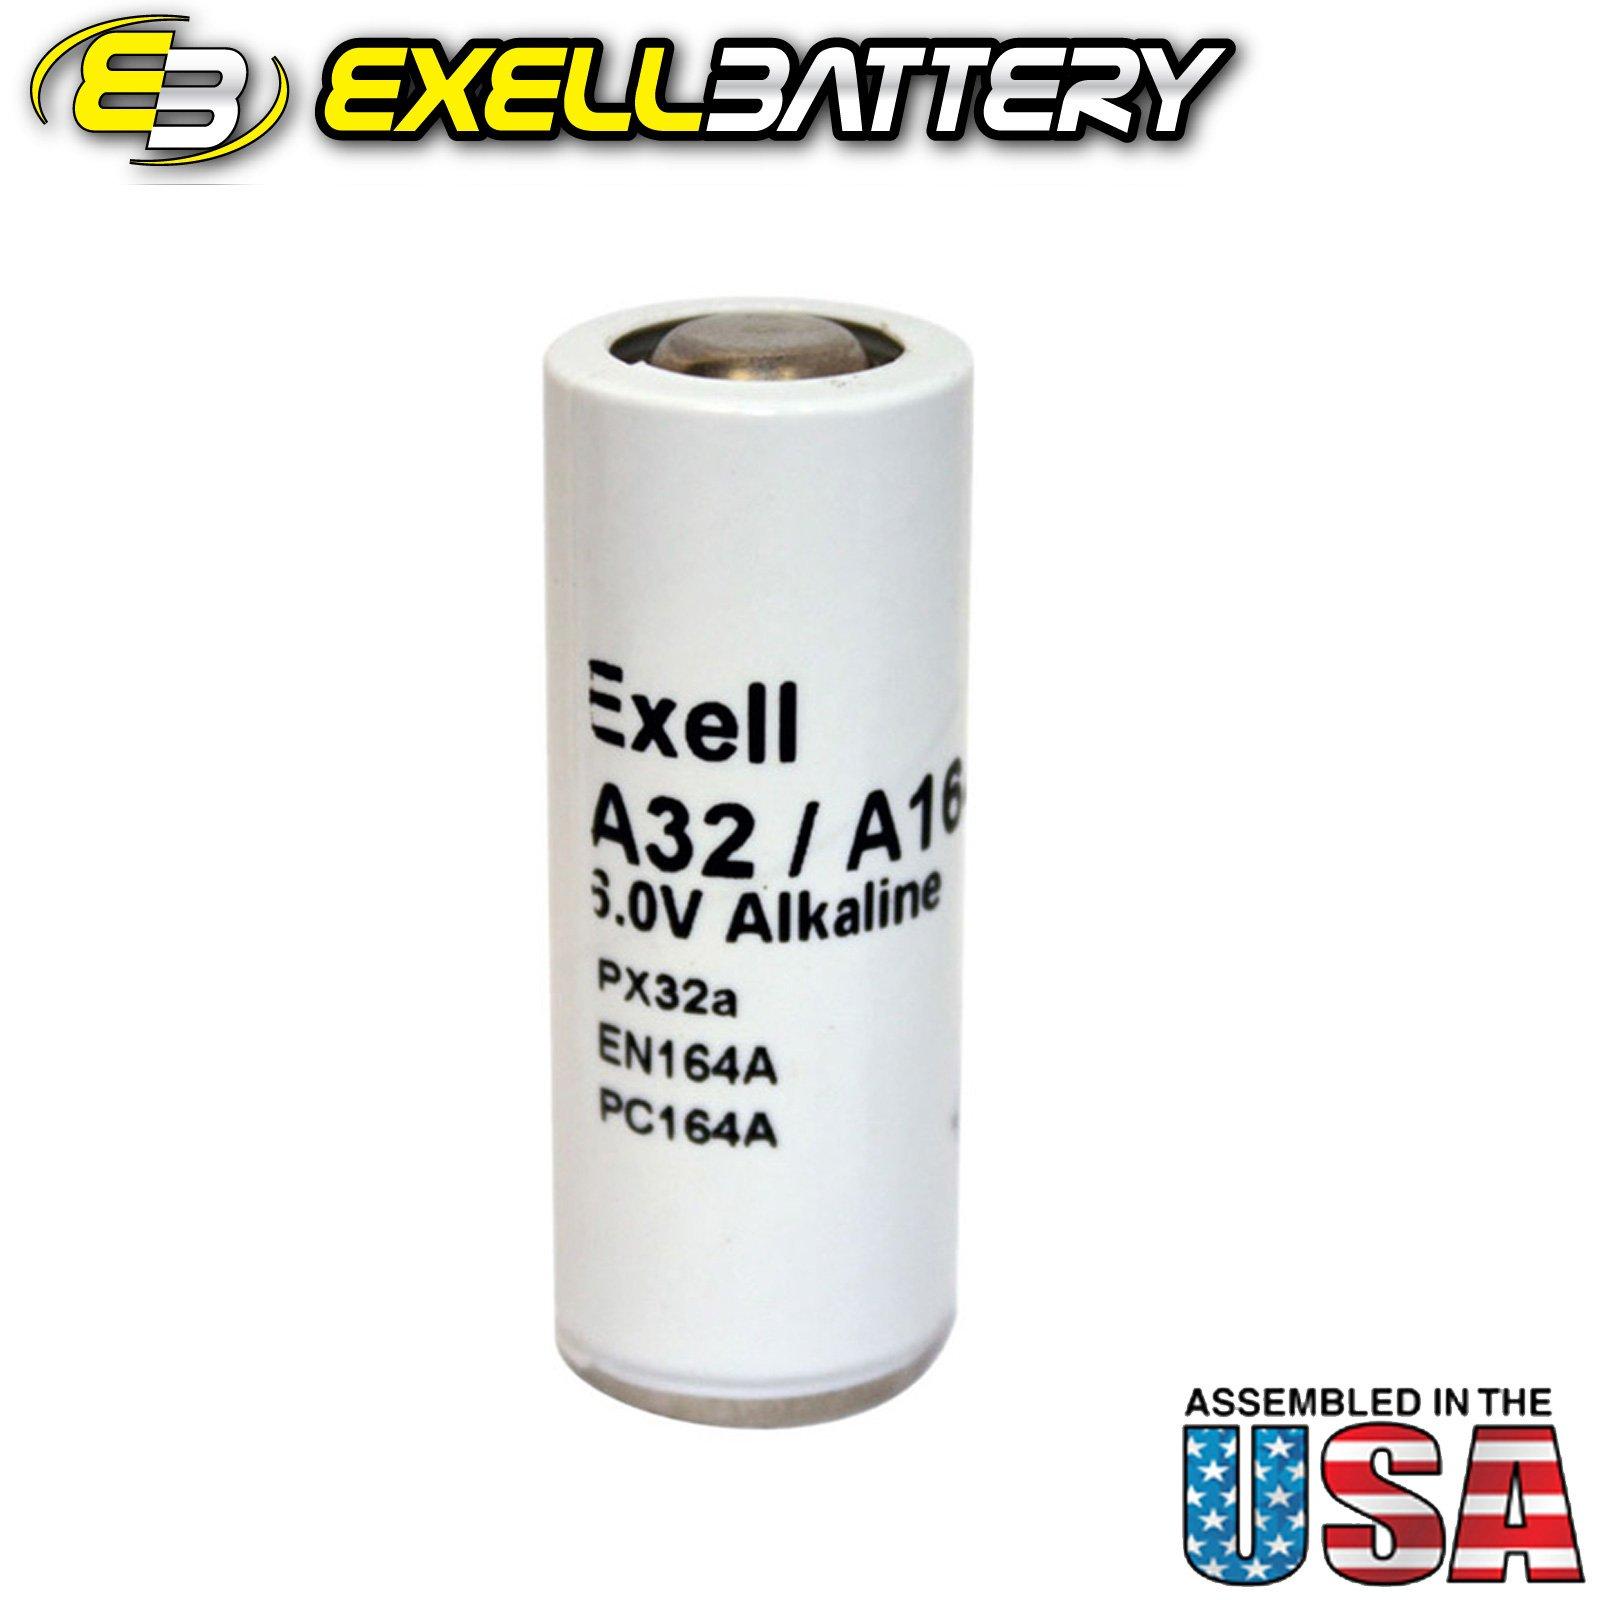 Exell A32PX 6V Alkaline Battery V32PXA, A32PX, PX32A, TR164A, EN164A, PX32, Mallory TR164, Eveready 164, E164, V164, National HM-4N, 4NR52, V164PX, 1404M by Exell Battery